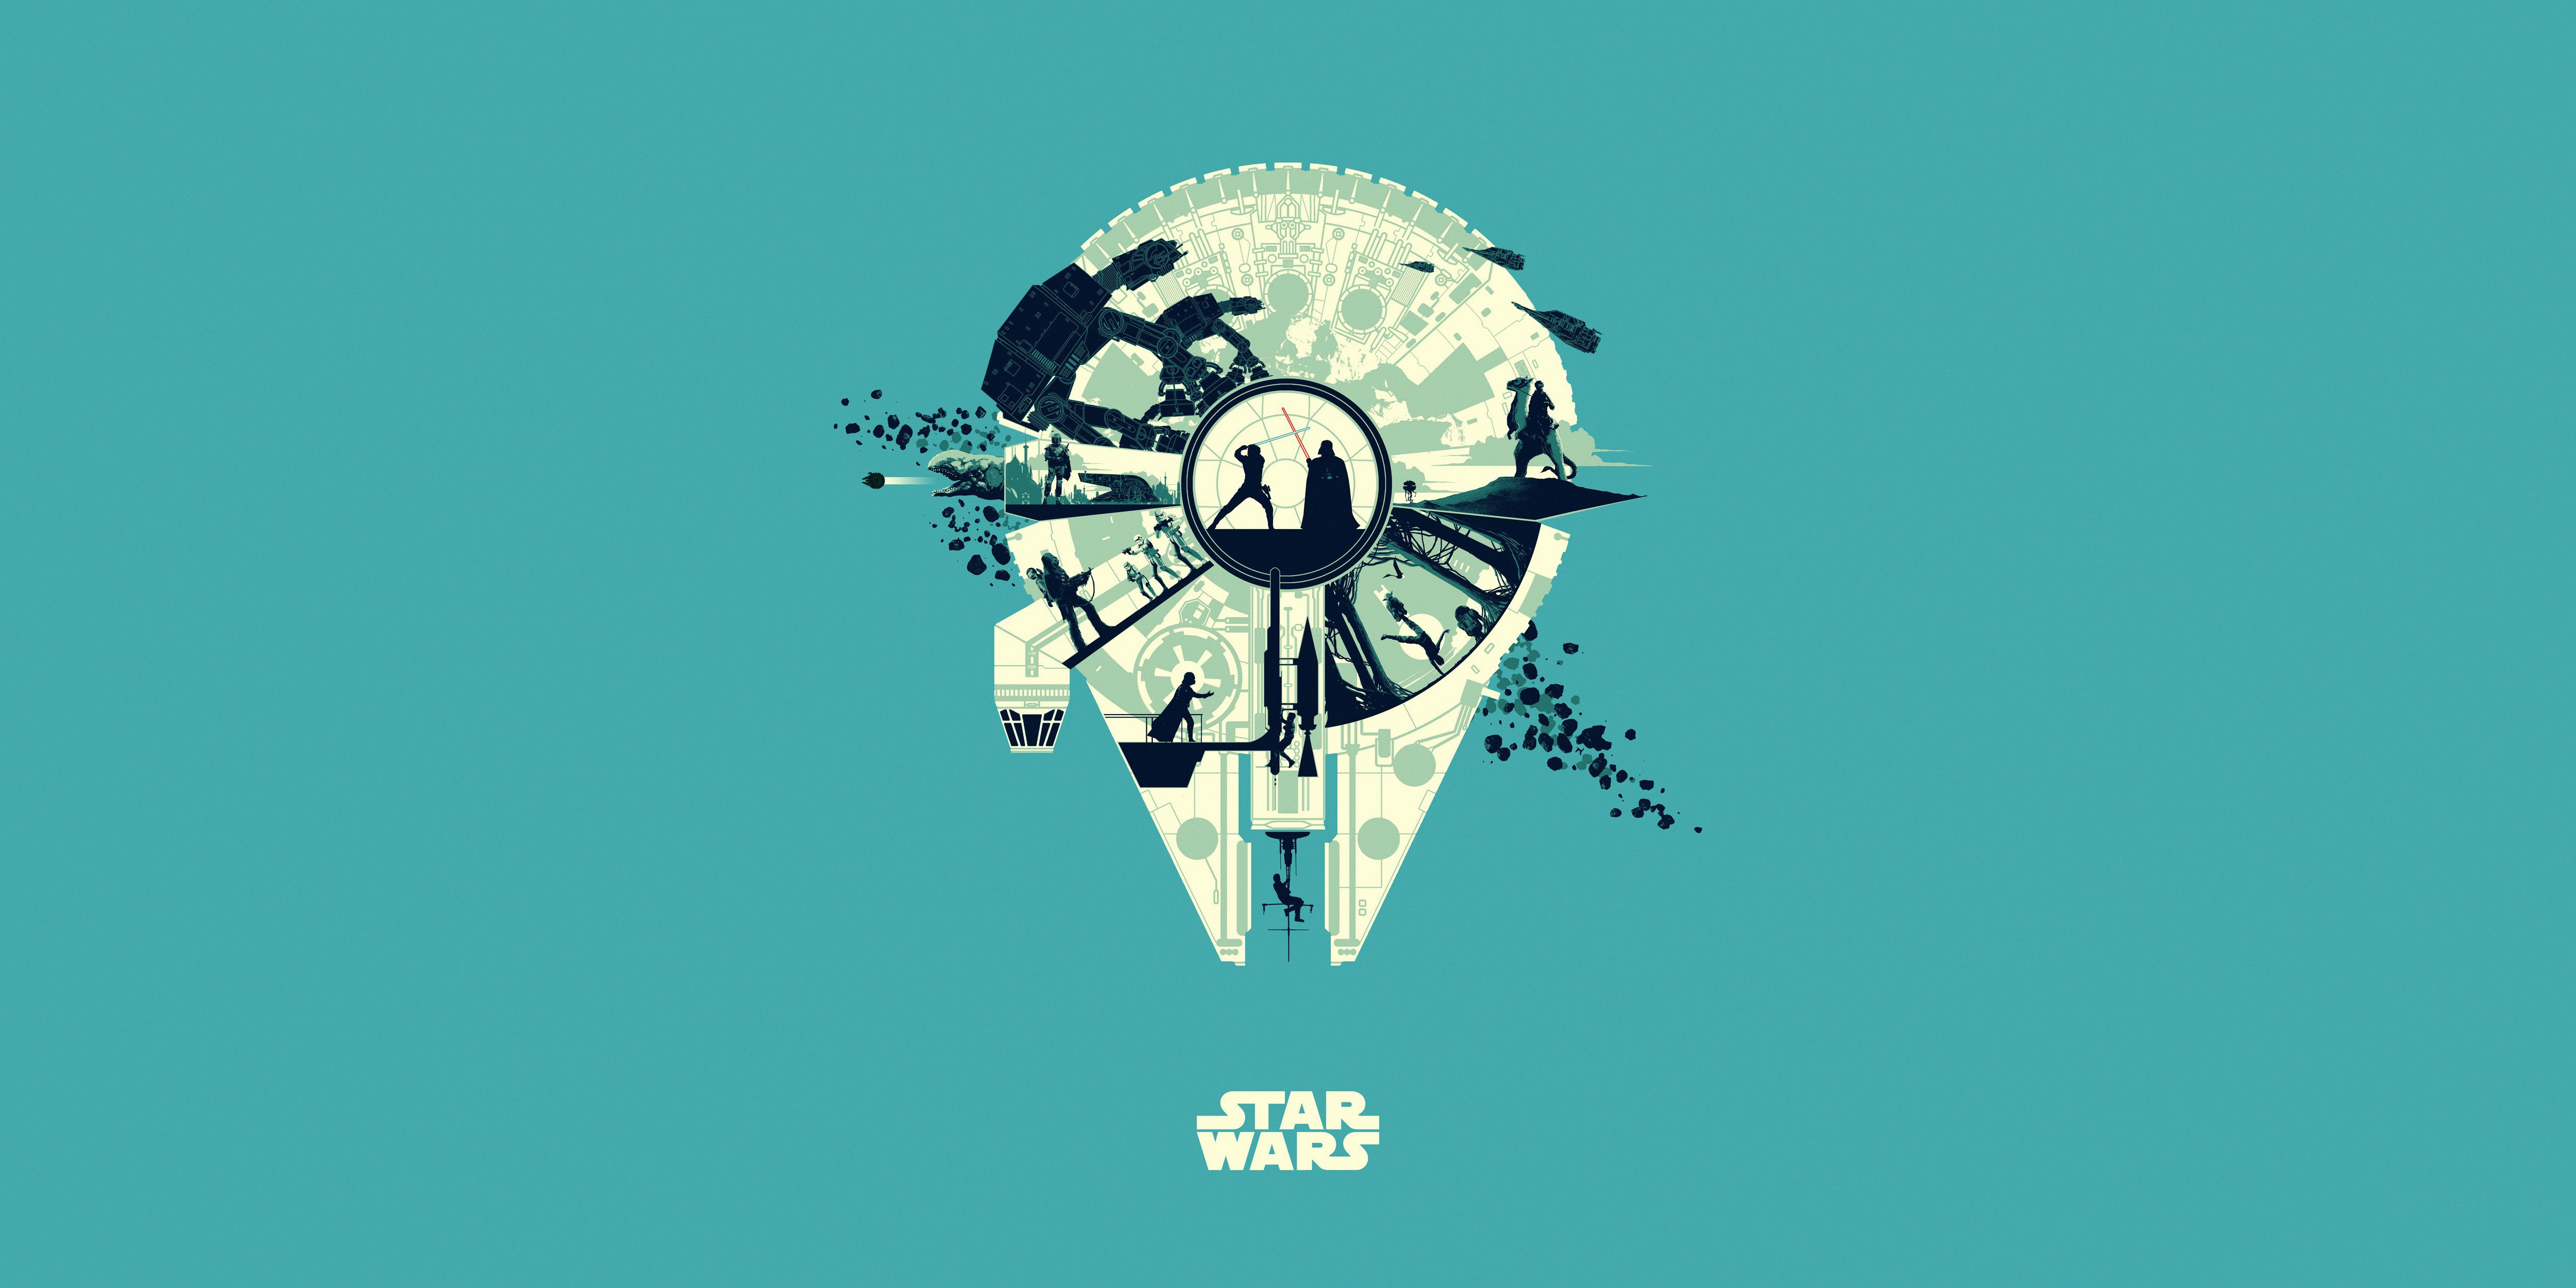 Star Wars 4k Ultra Hd Wallpaper Background Image 5000x2500 Id 1053219 Wallpaper Abyss